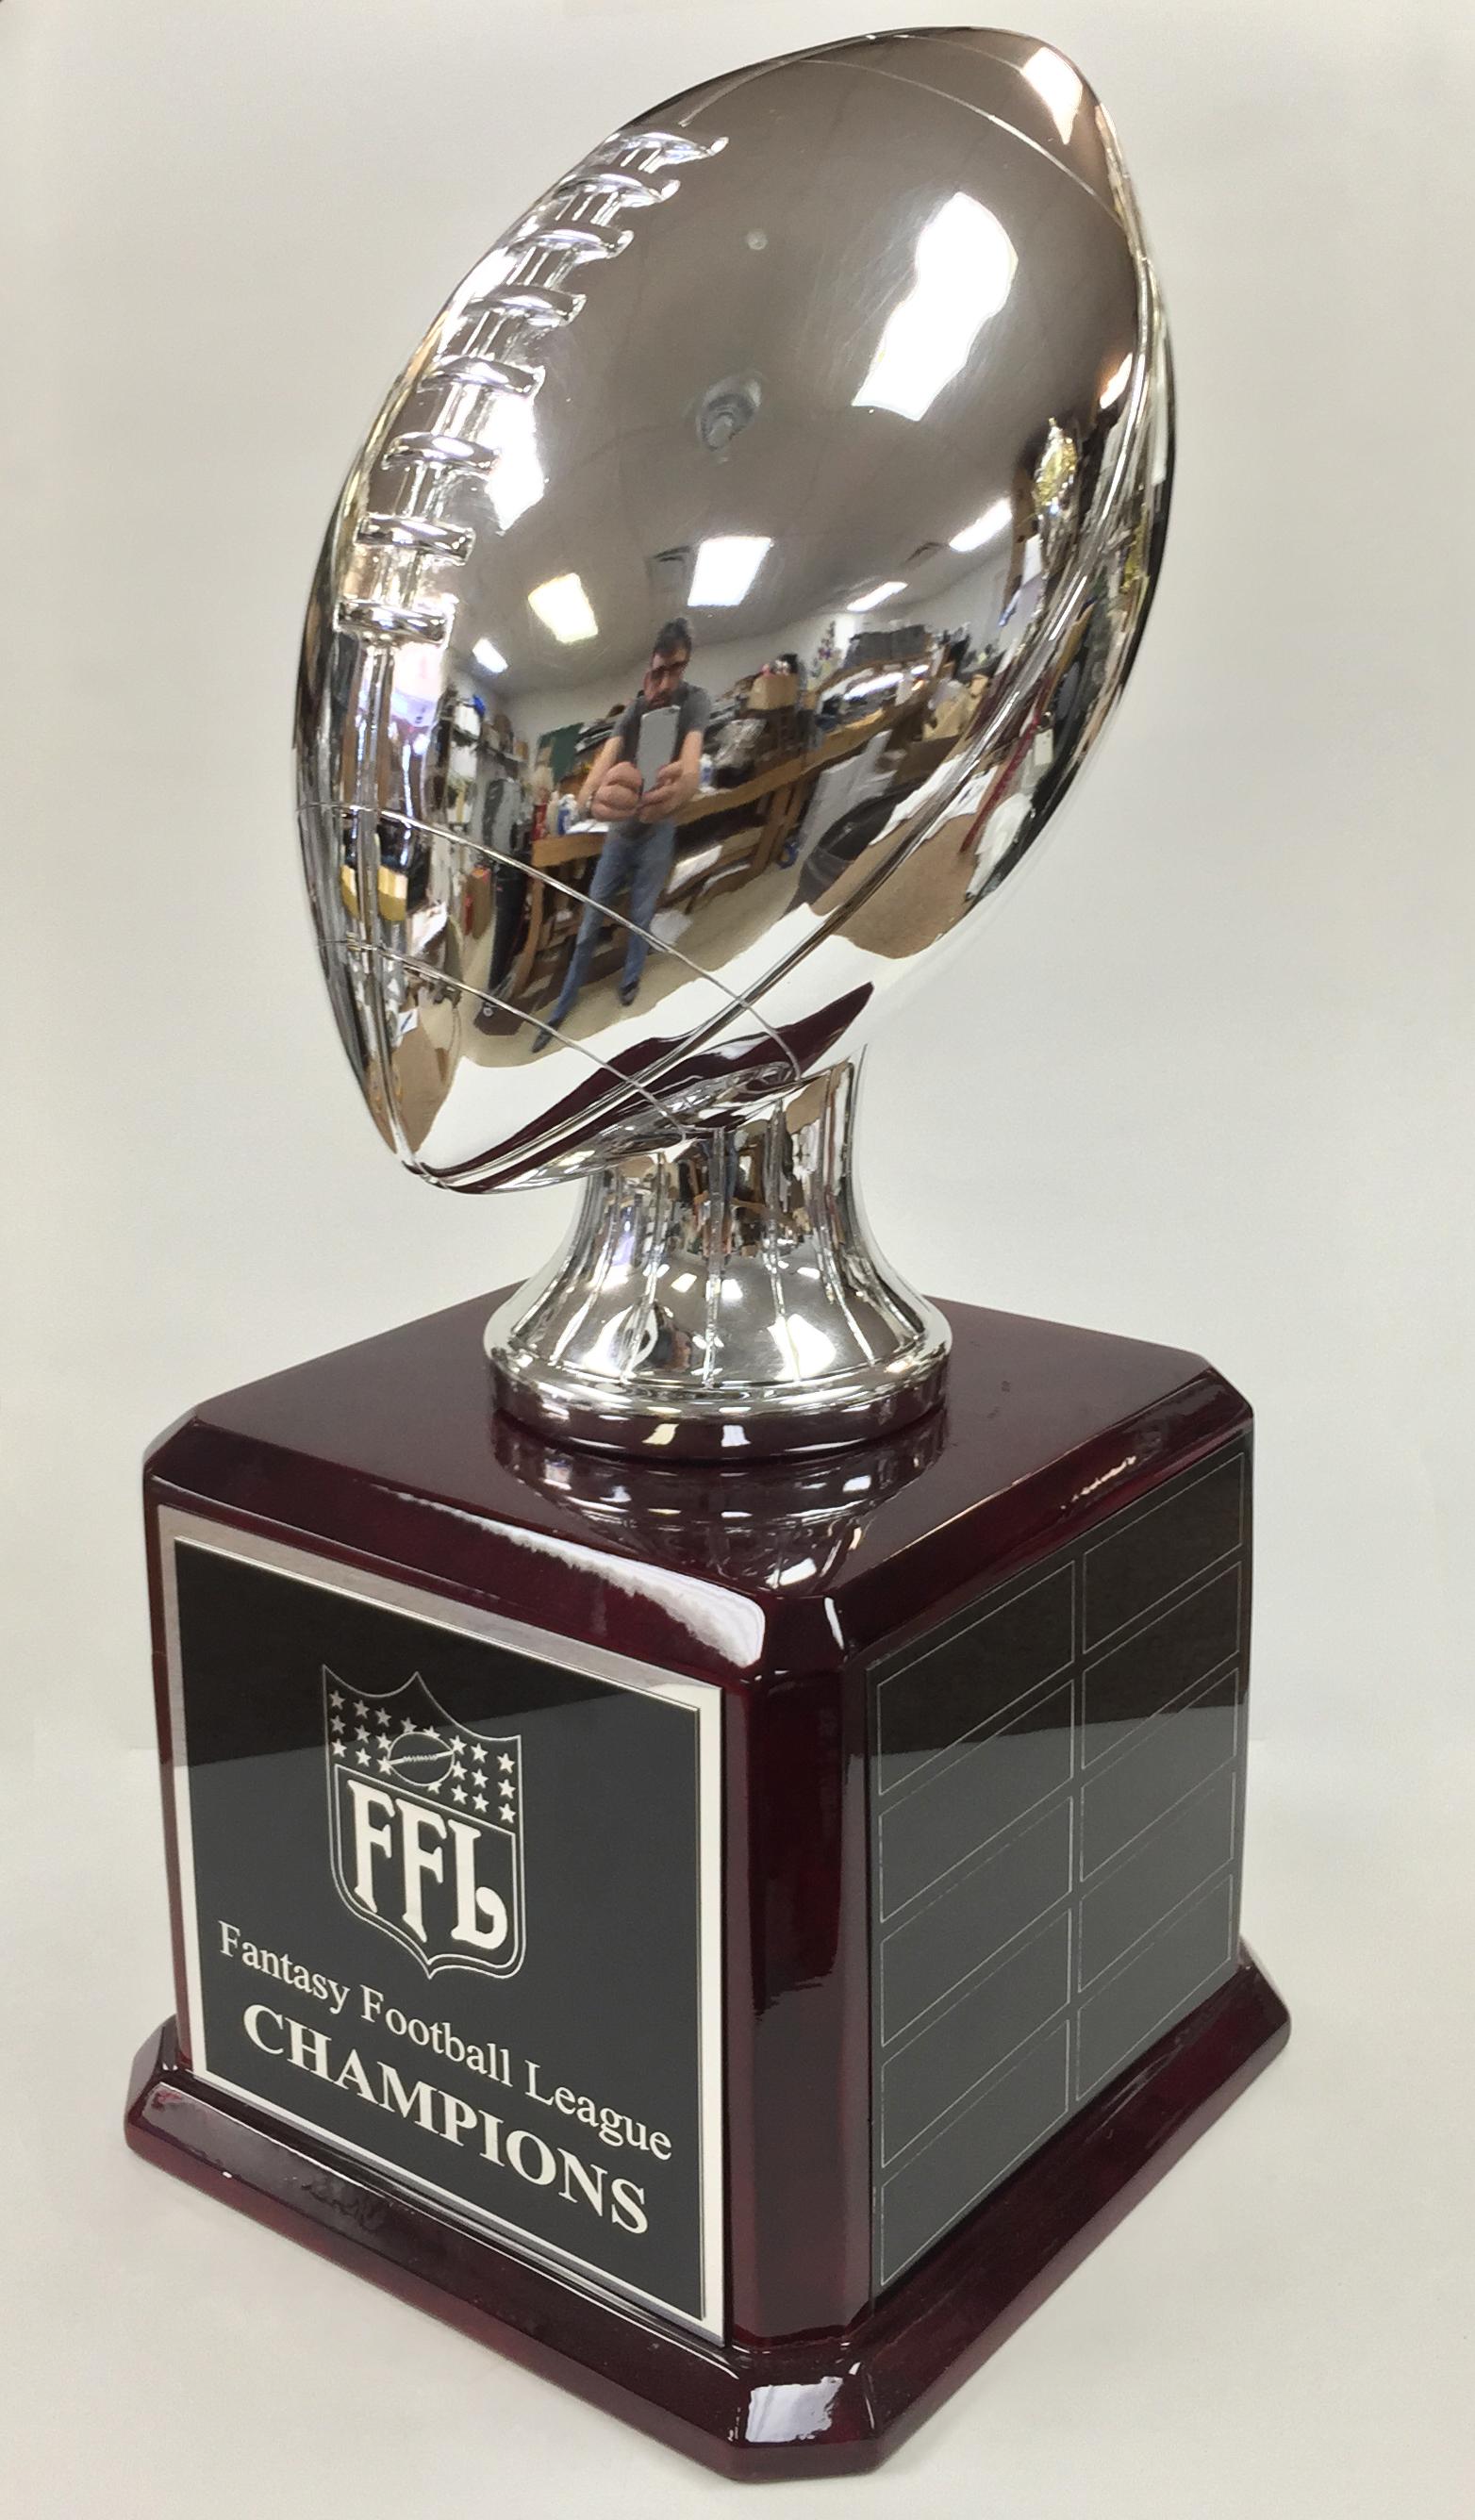 Kevin Hart Mustang >> Fantasy Football Trophy Images